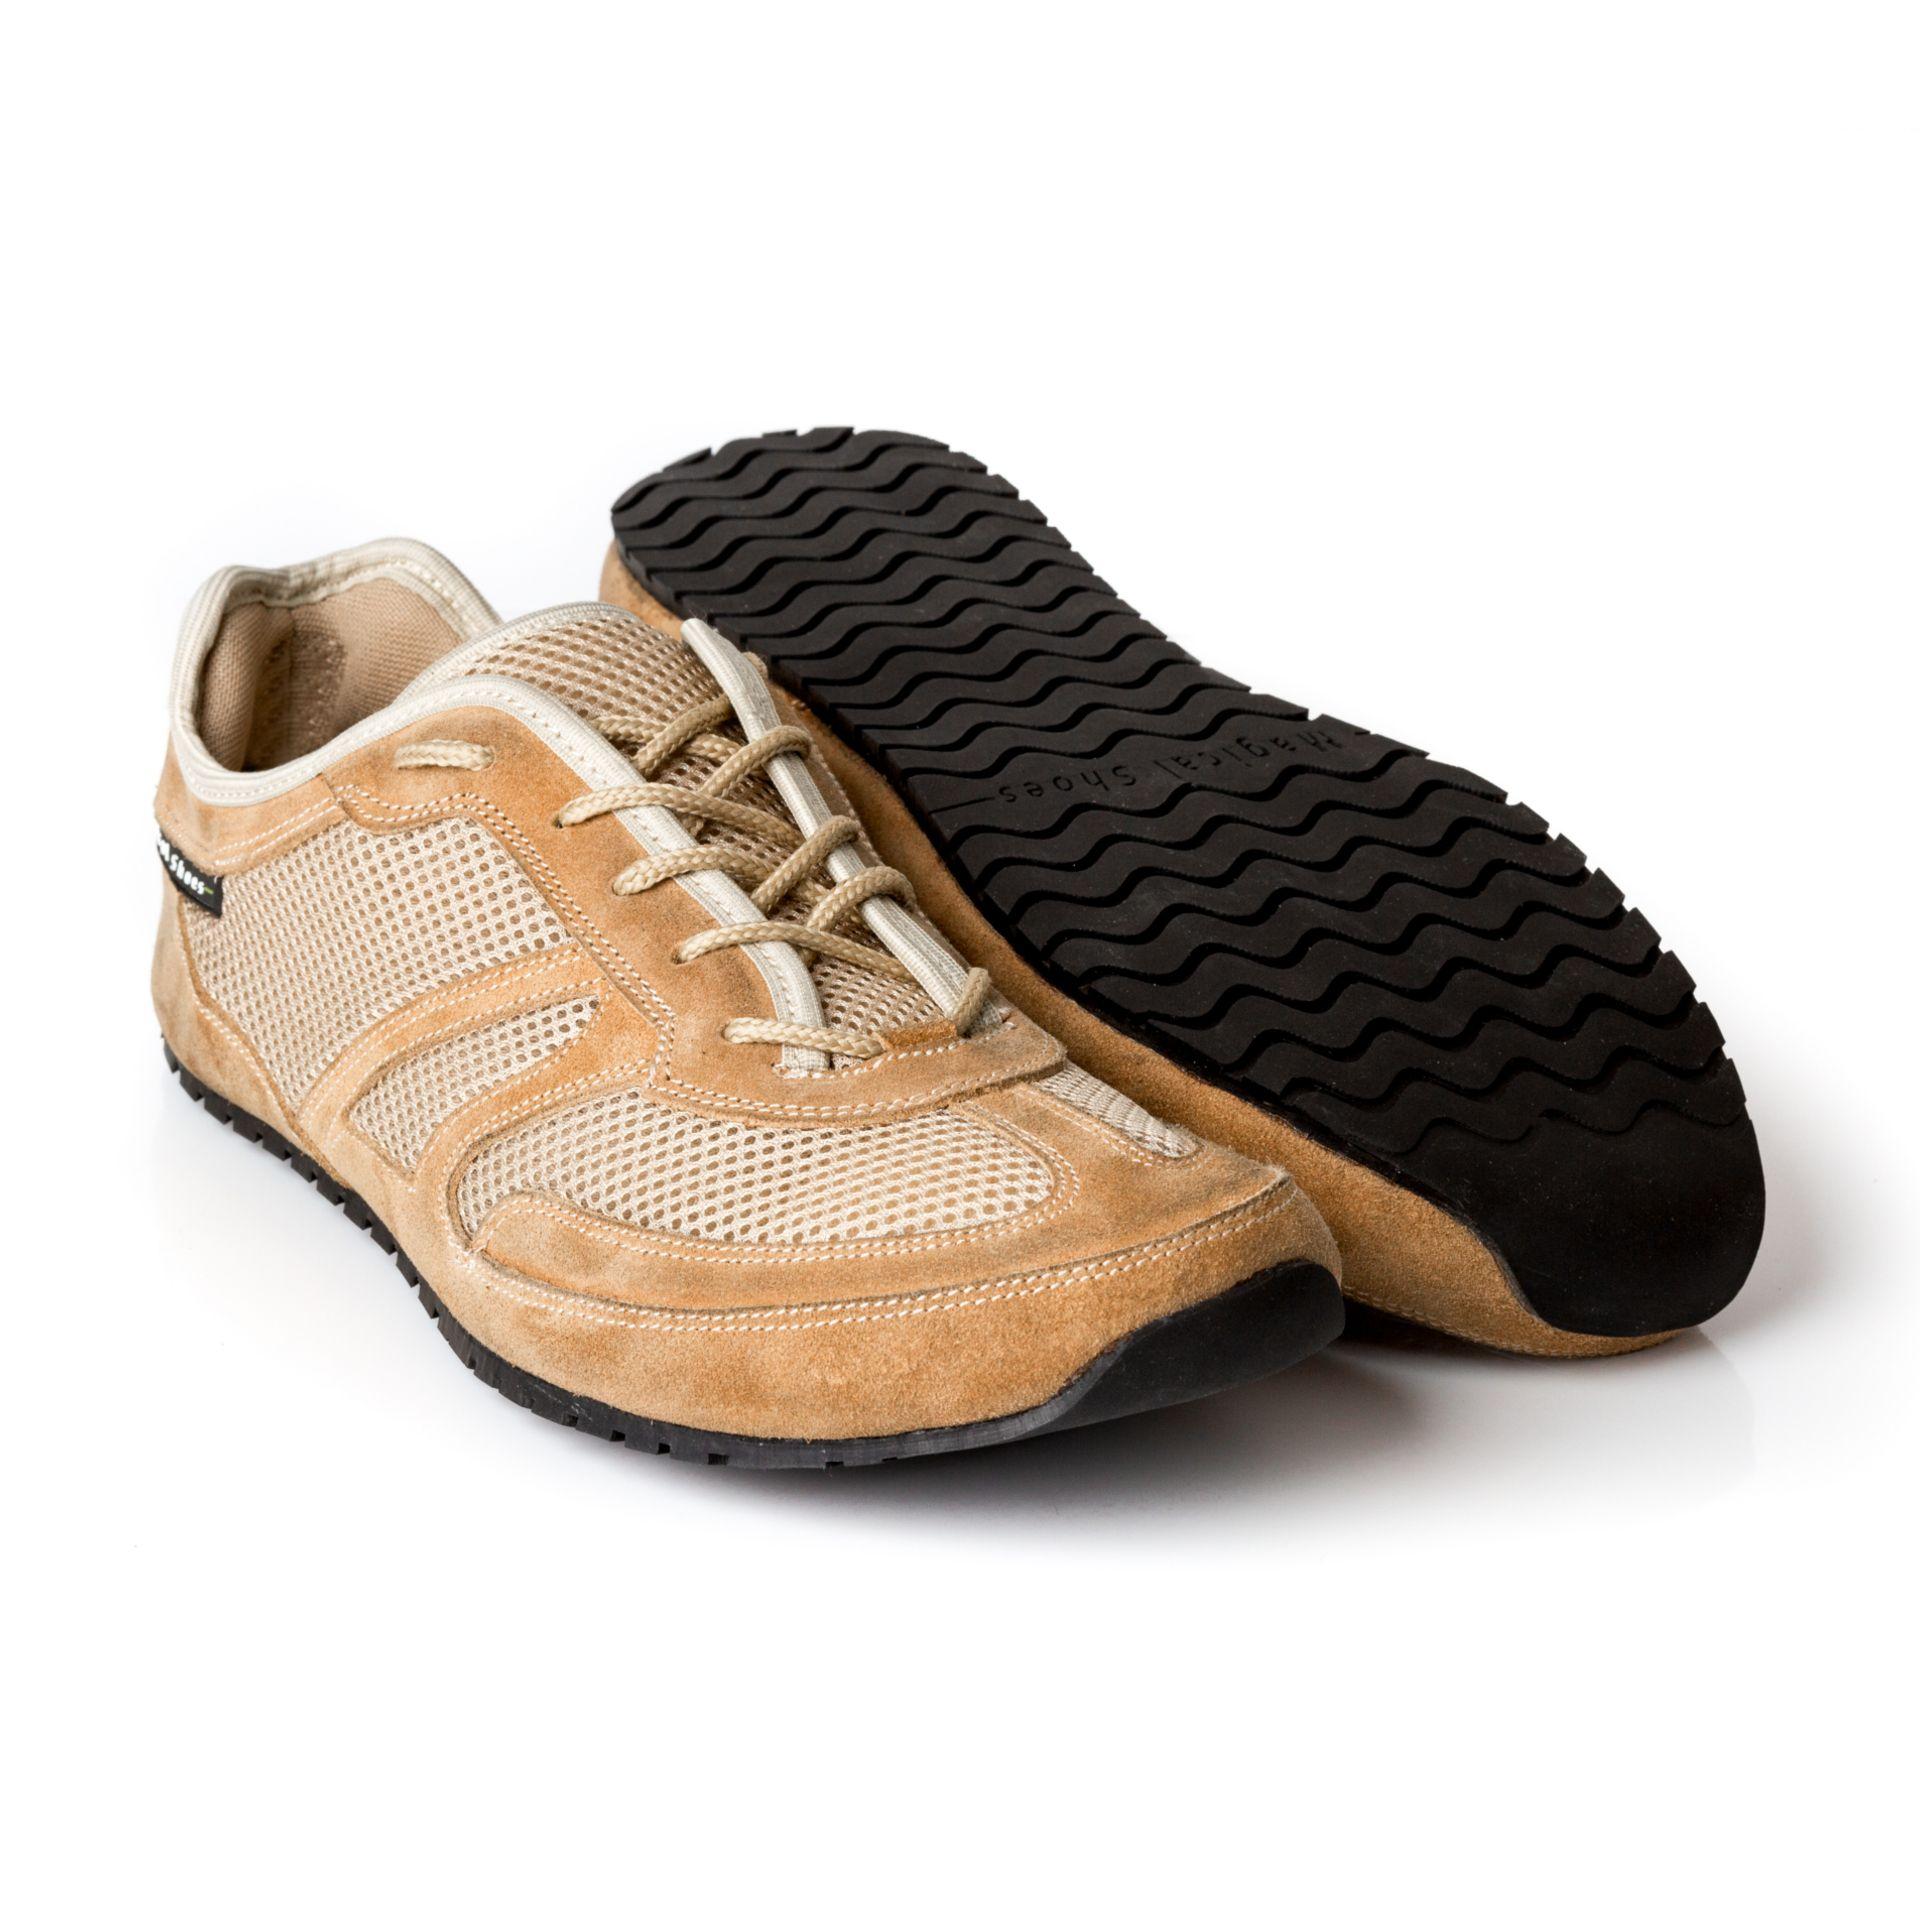 Skorzane Buty Minimalistyczne Magical Shoes Explorer Hot Sun Polski Producent Obuwia Minimalistycznego Skorzane Buty Mi Minimalist Shoes Barefoot Shoes Shoes